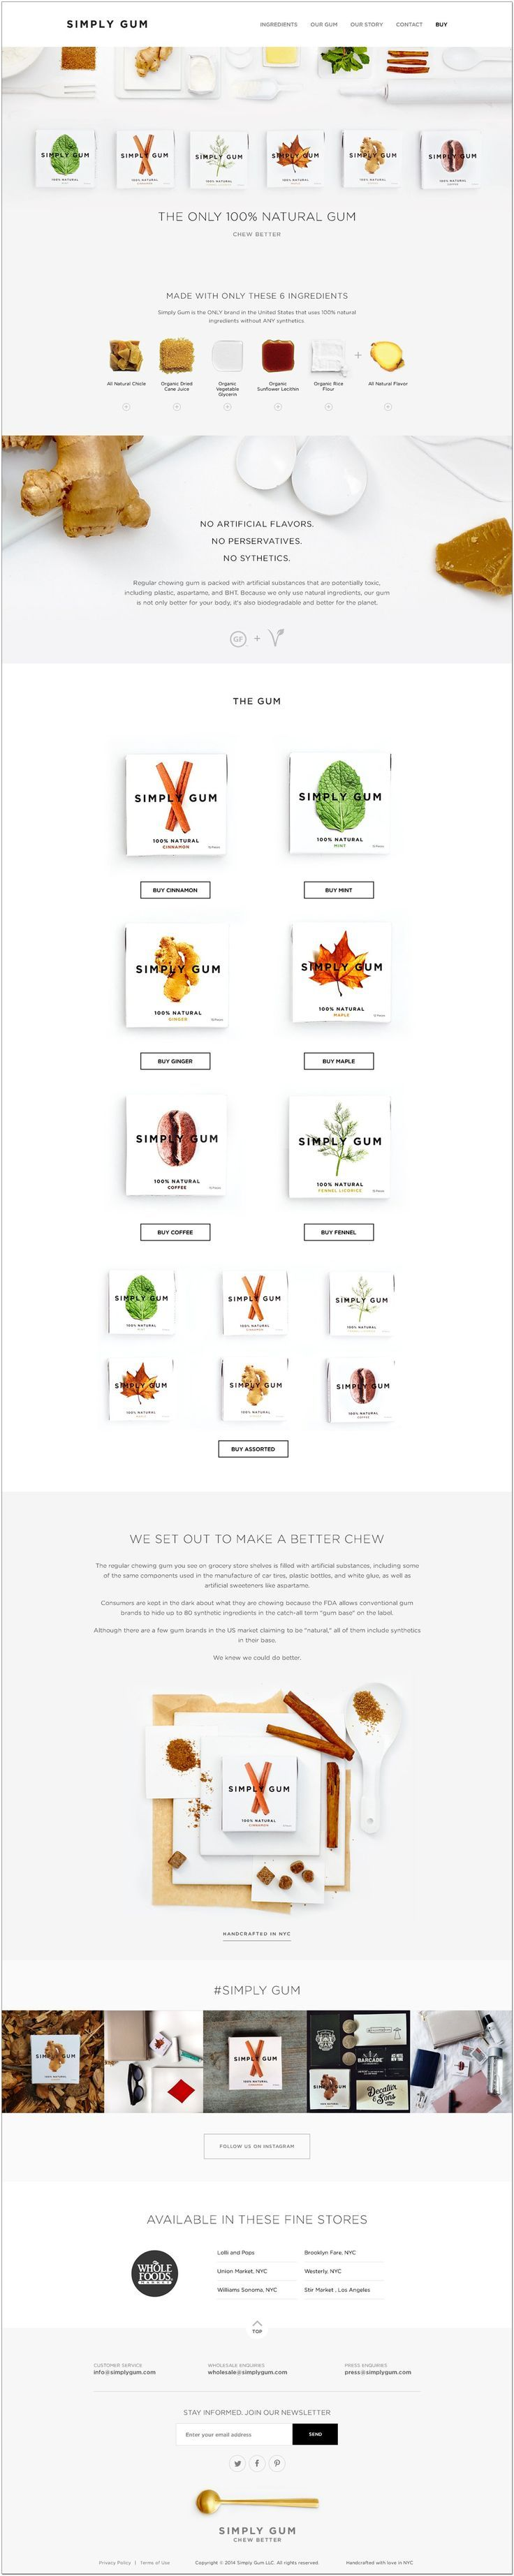 Daily Web Design And Development Inspirations No.432  Latest News & Trends on #webdesign | http://webworksagency.com